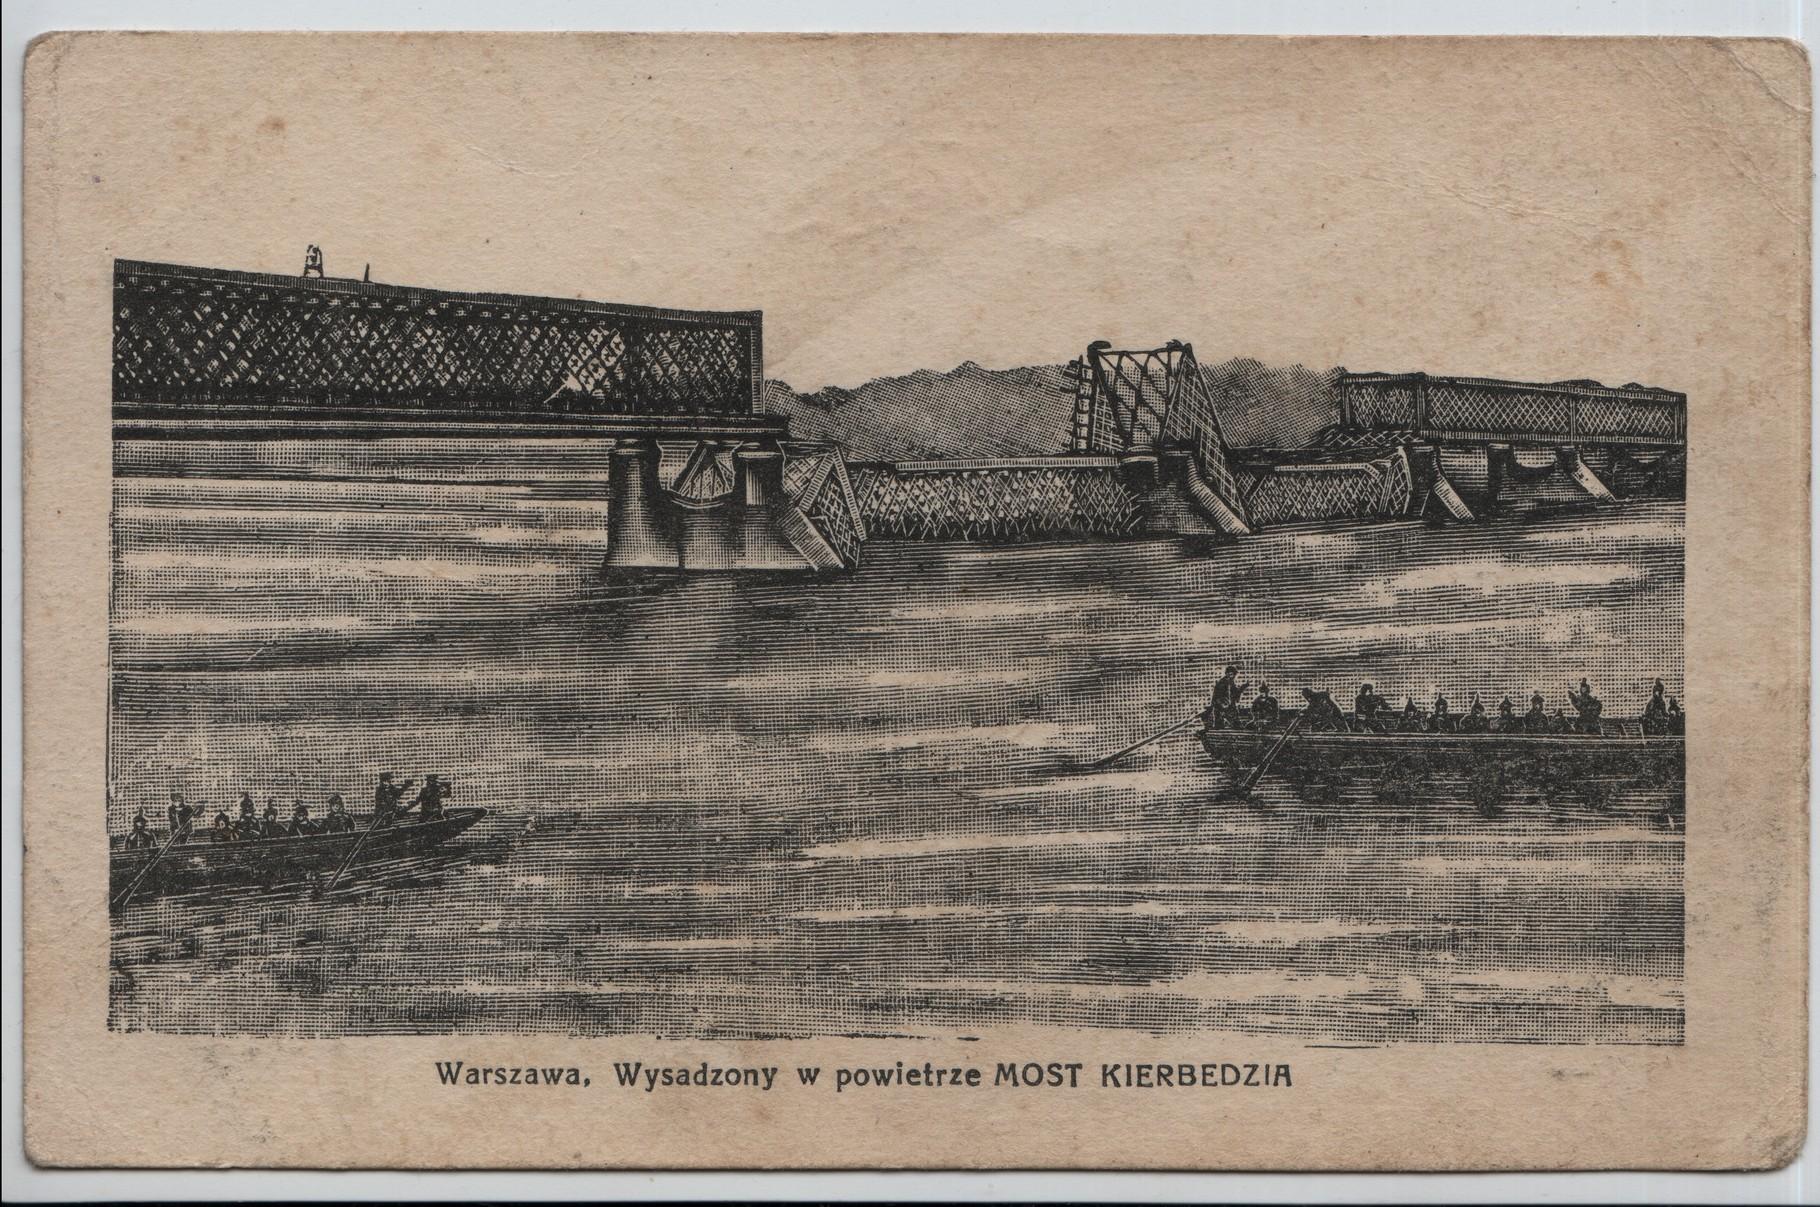 3. Warsaw: the Kierbedzia bridge blown up